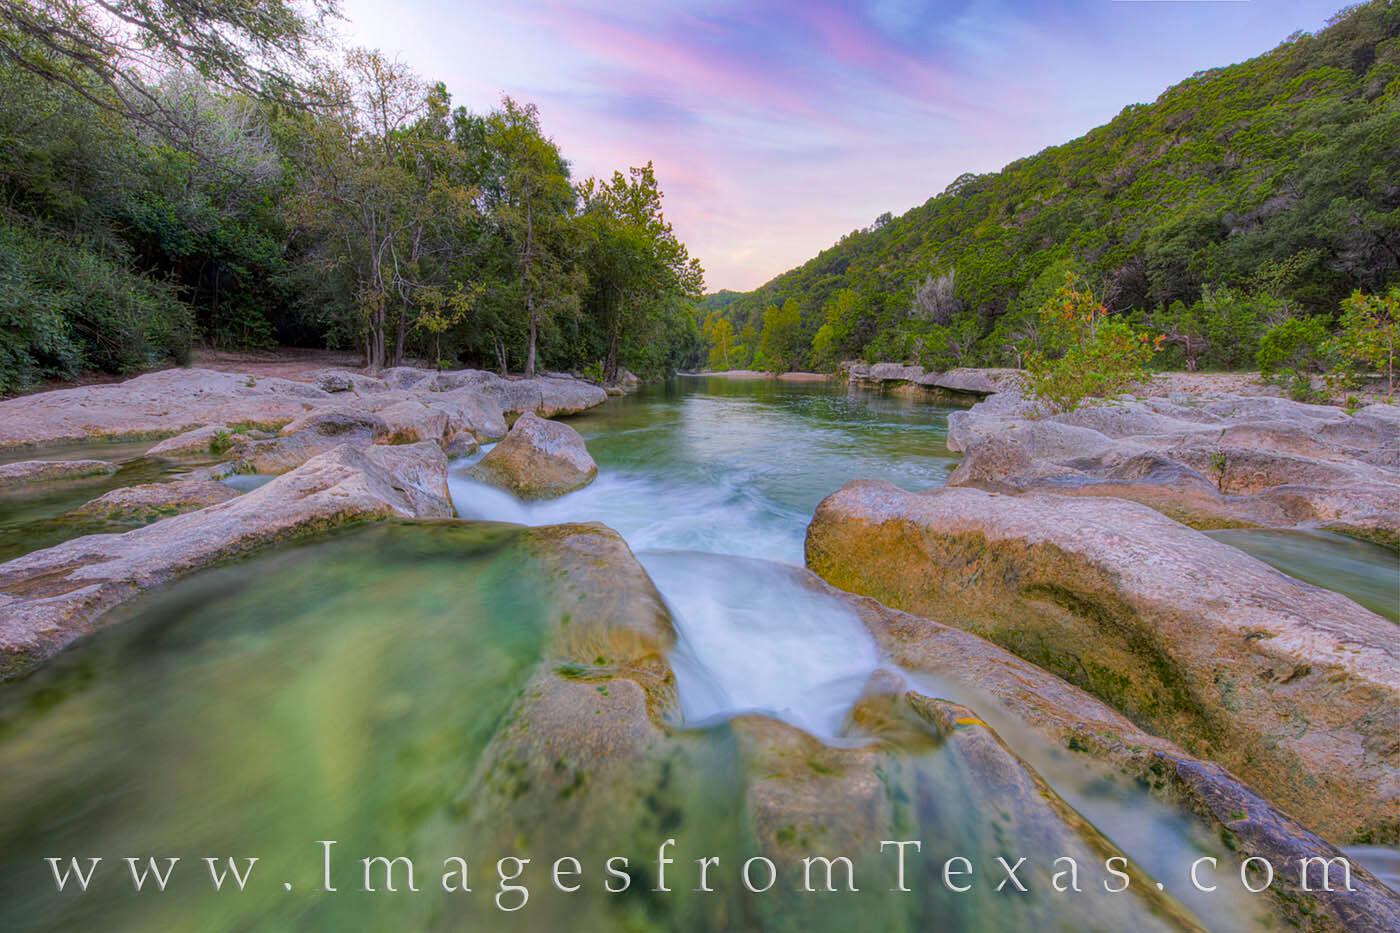 austin texas, barton creek, barton creek greenbelt, sculpture falls, austin creeks, austin greenbelt, photo